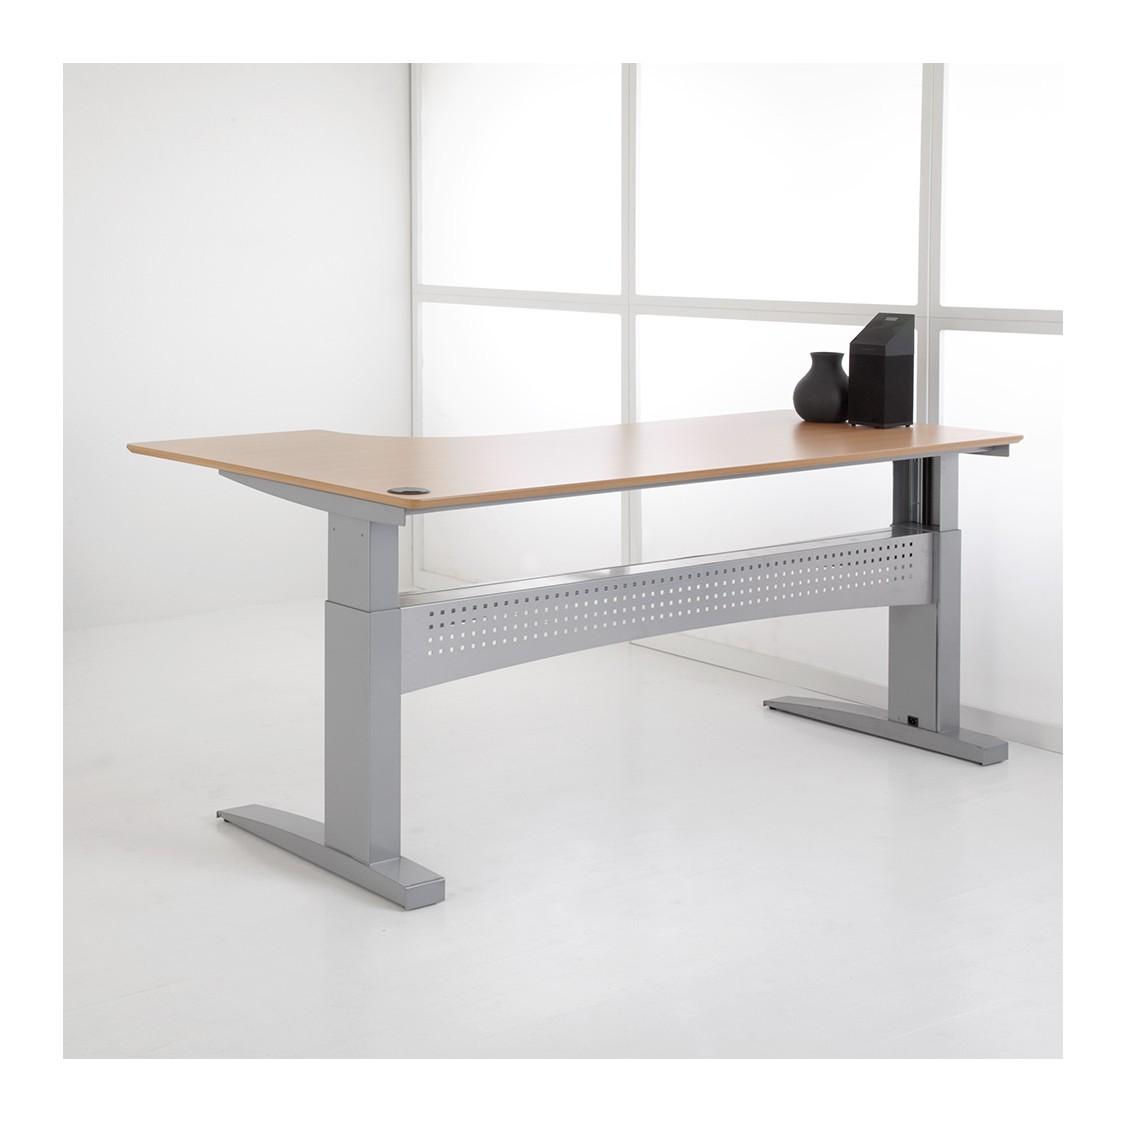 ad111hd adjustable height desk ... QKNLVBH